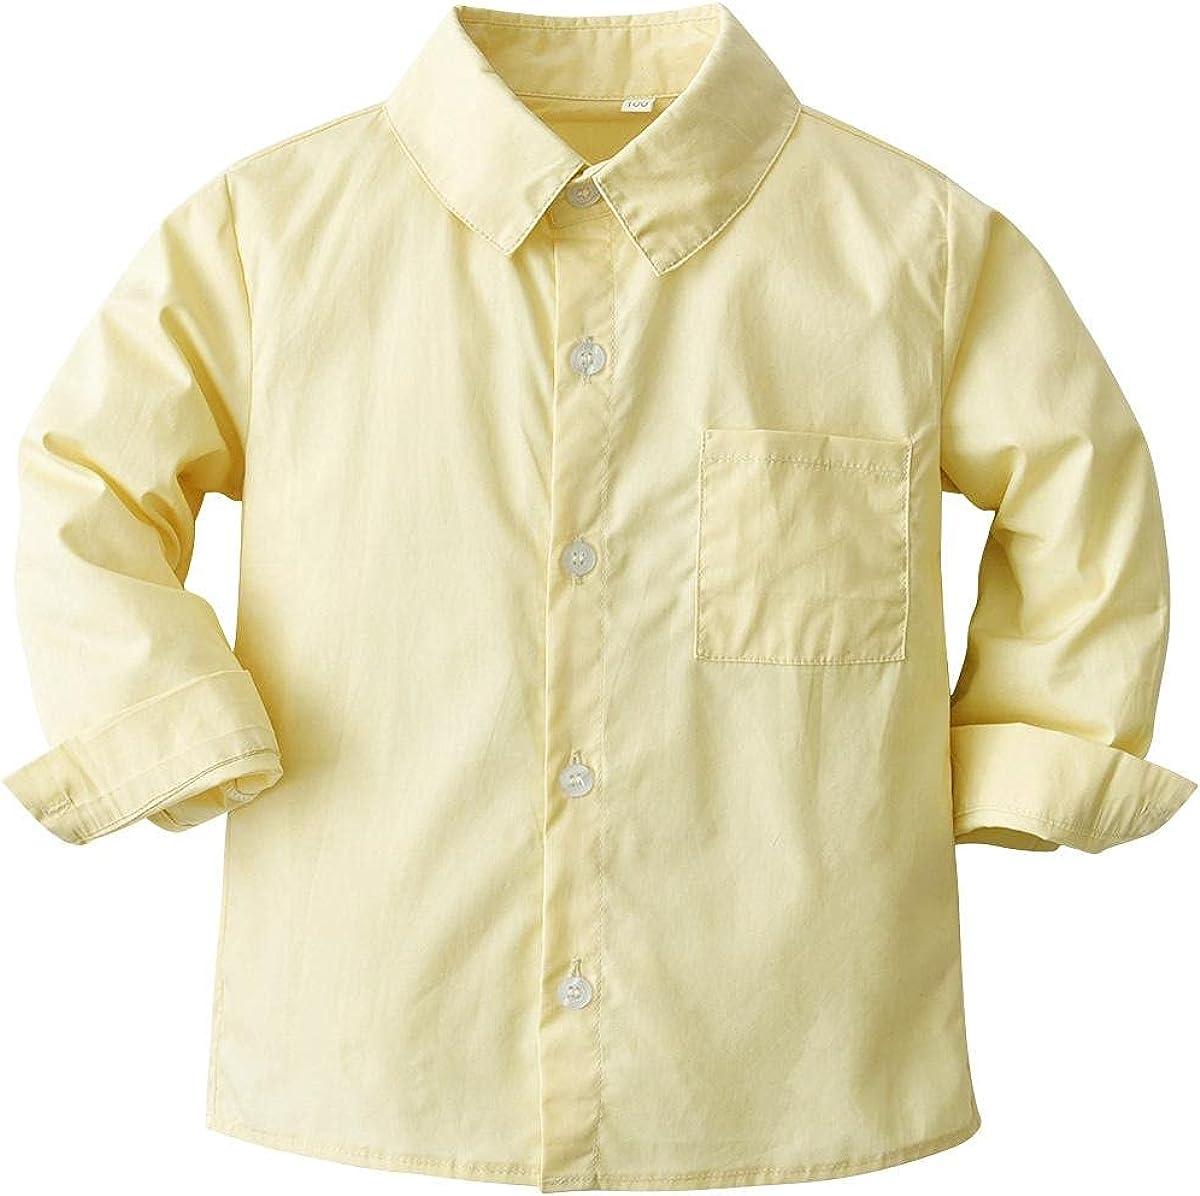 LAPA Baby Boys Dress Shirt Long Sleeve, Oxford Button Down Shirt for 6M-4Y